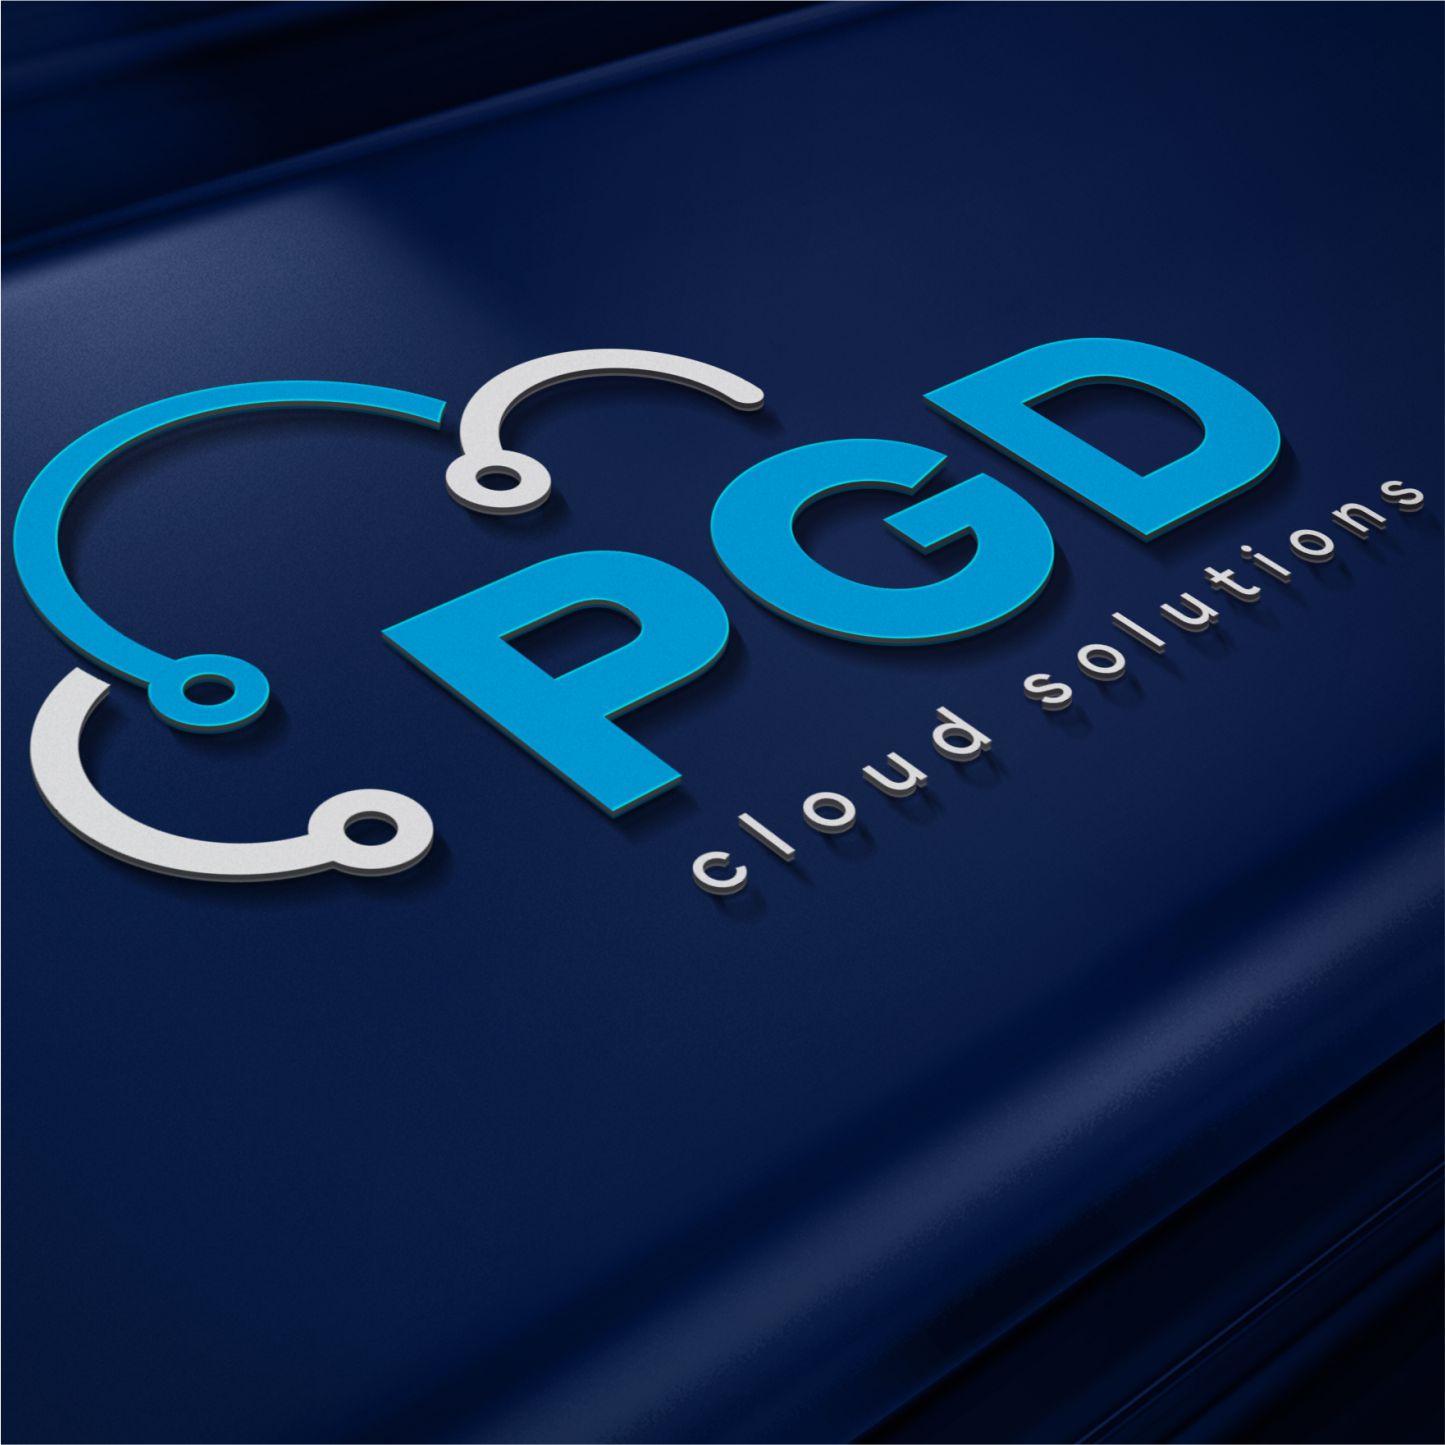 aplicacao-de-marca-pgd-cloud